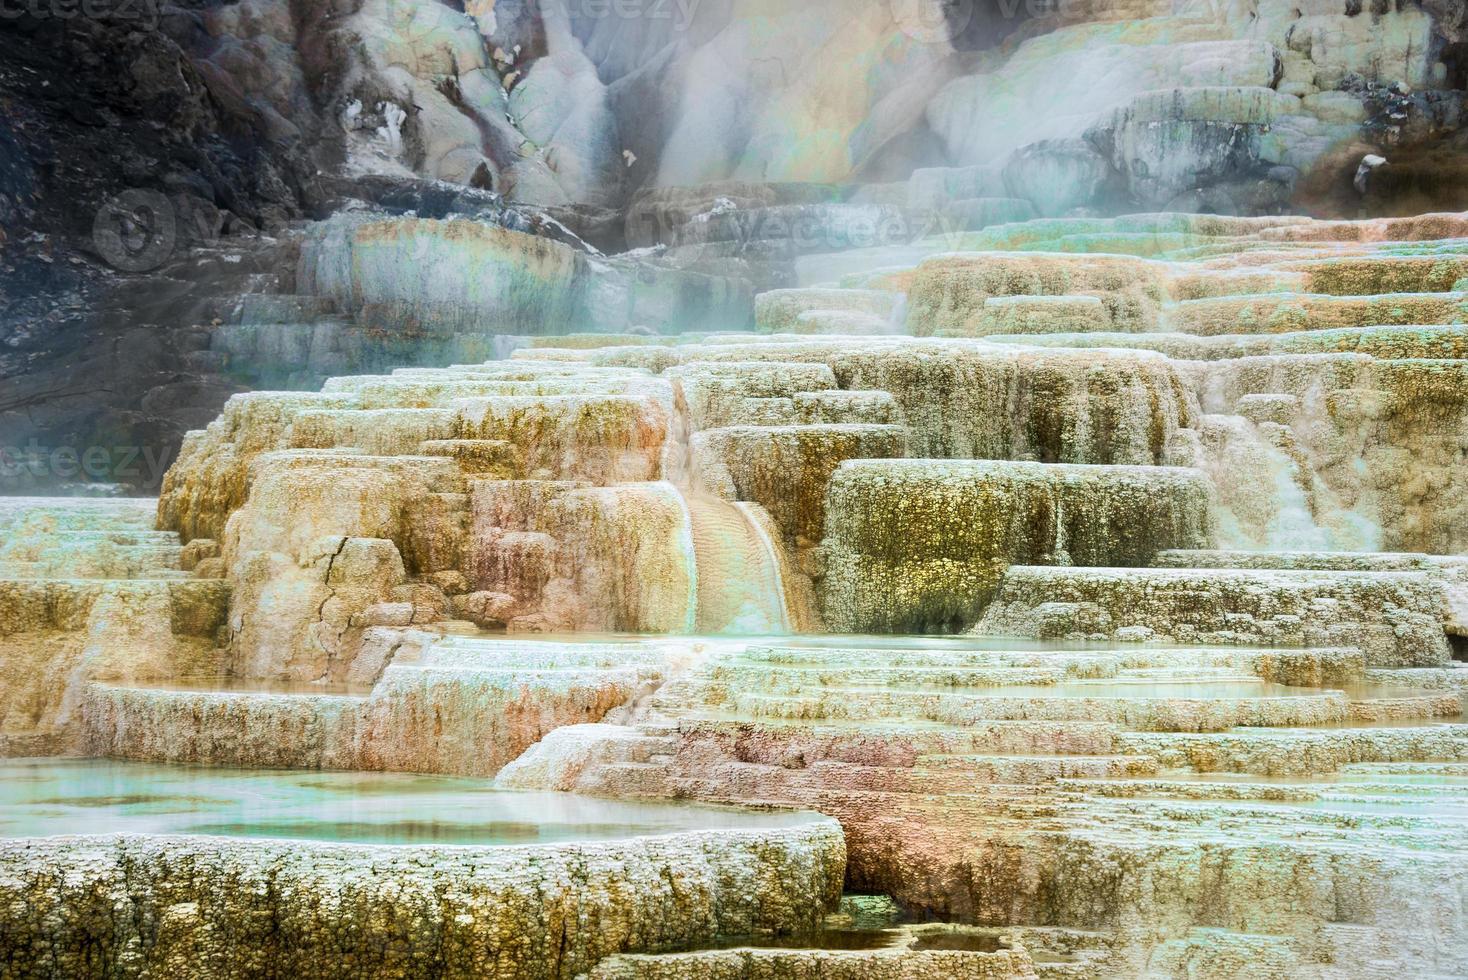 Mammoth Hot Springs foto